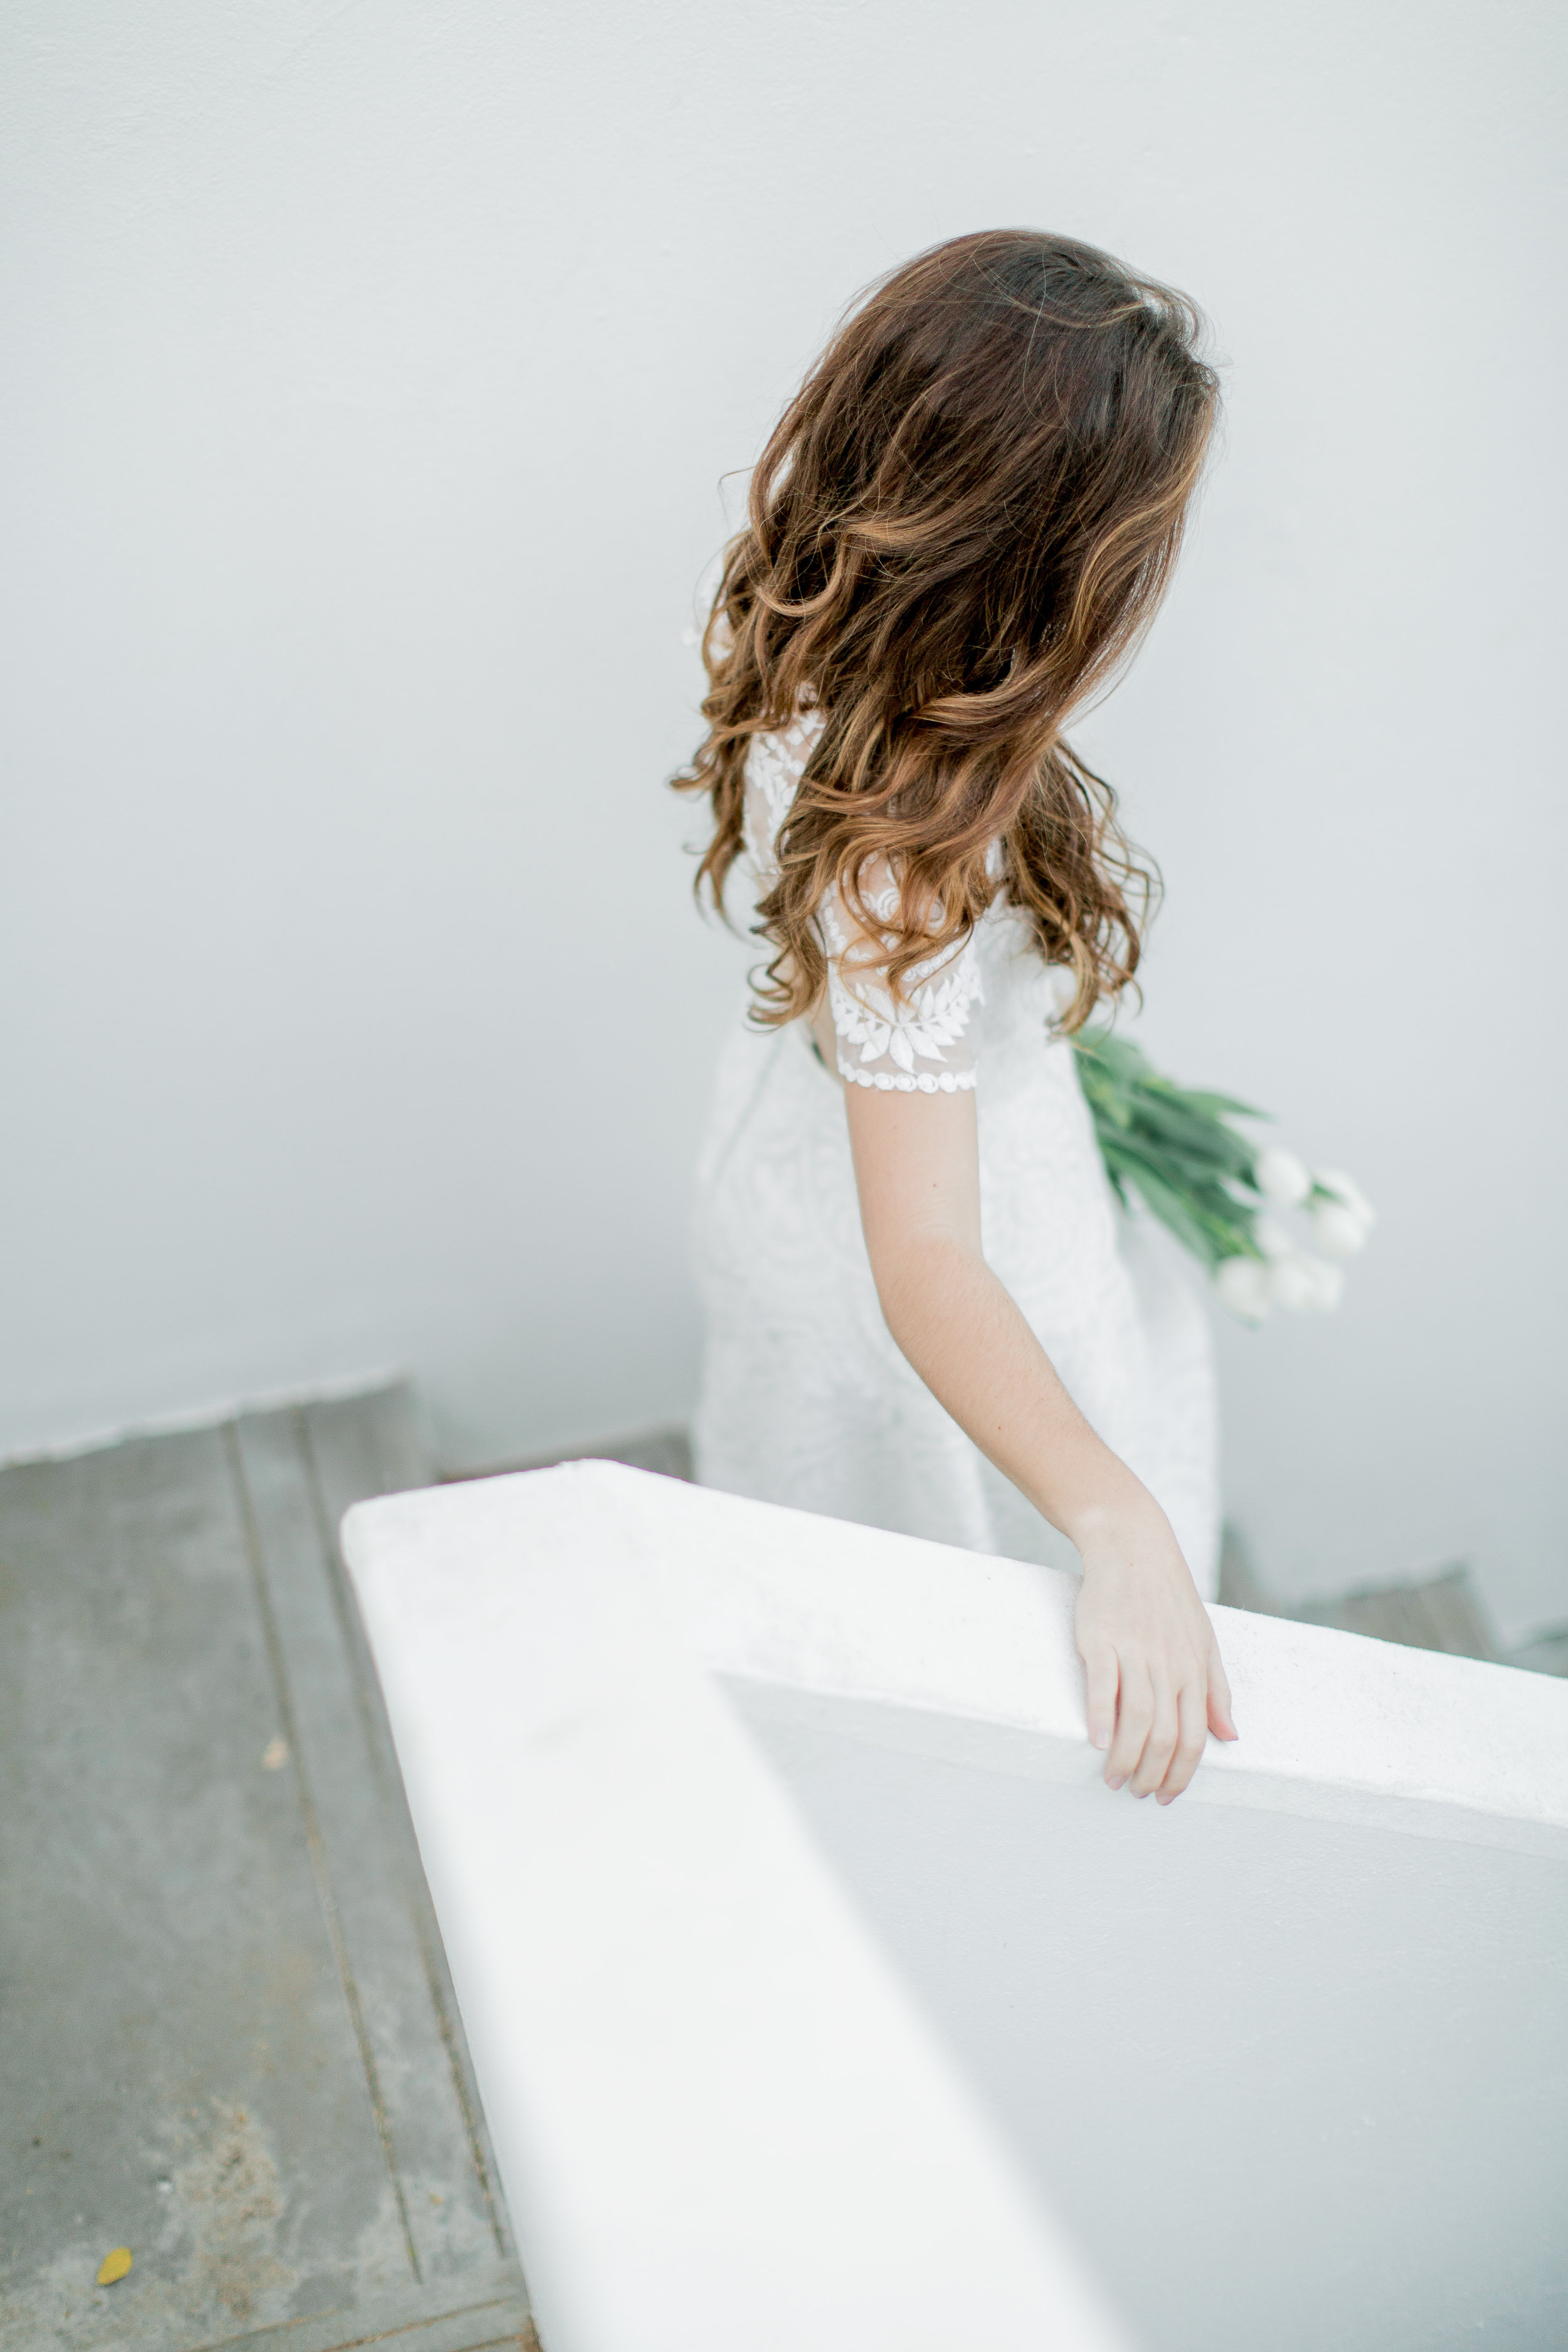 gauteng wedding photographer clareece smit35.jpg